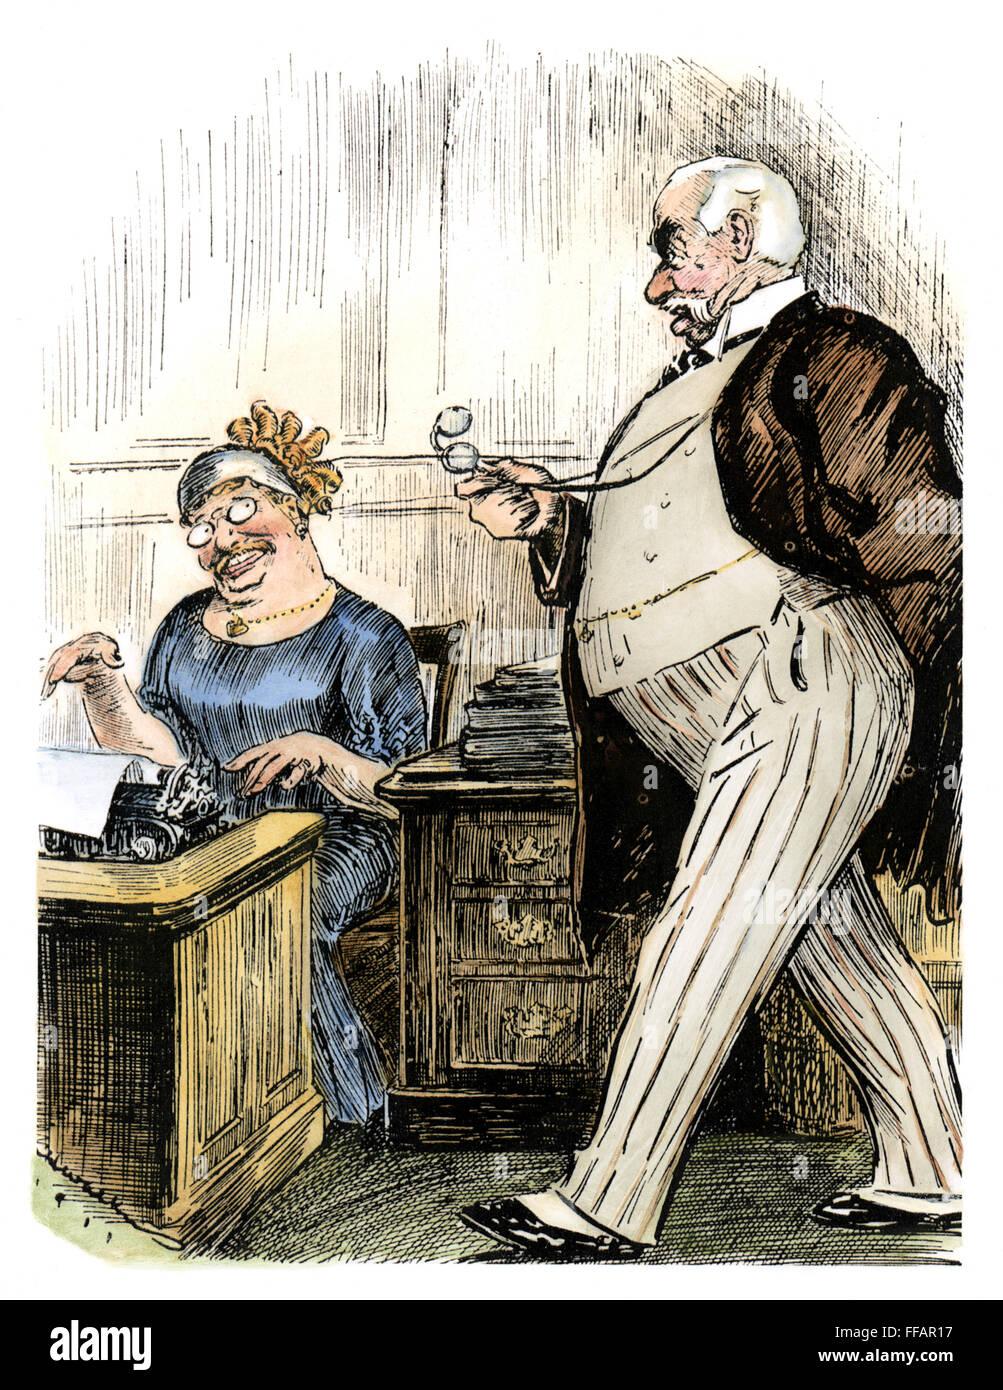 MORGAN & ROOSEVELT, c1905. /nAmerican banker and financier J.P. Morgan gives dictation to his secretary, an obedient Stock Photo